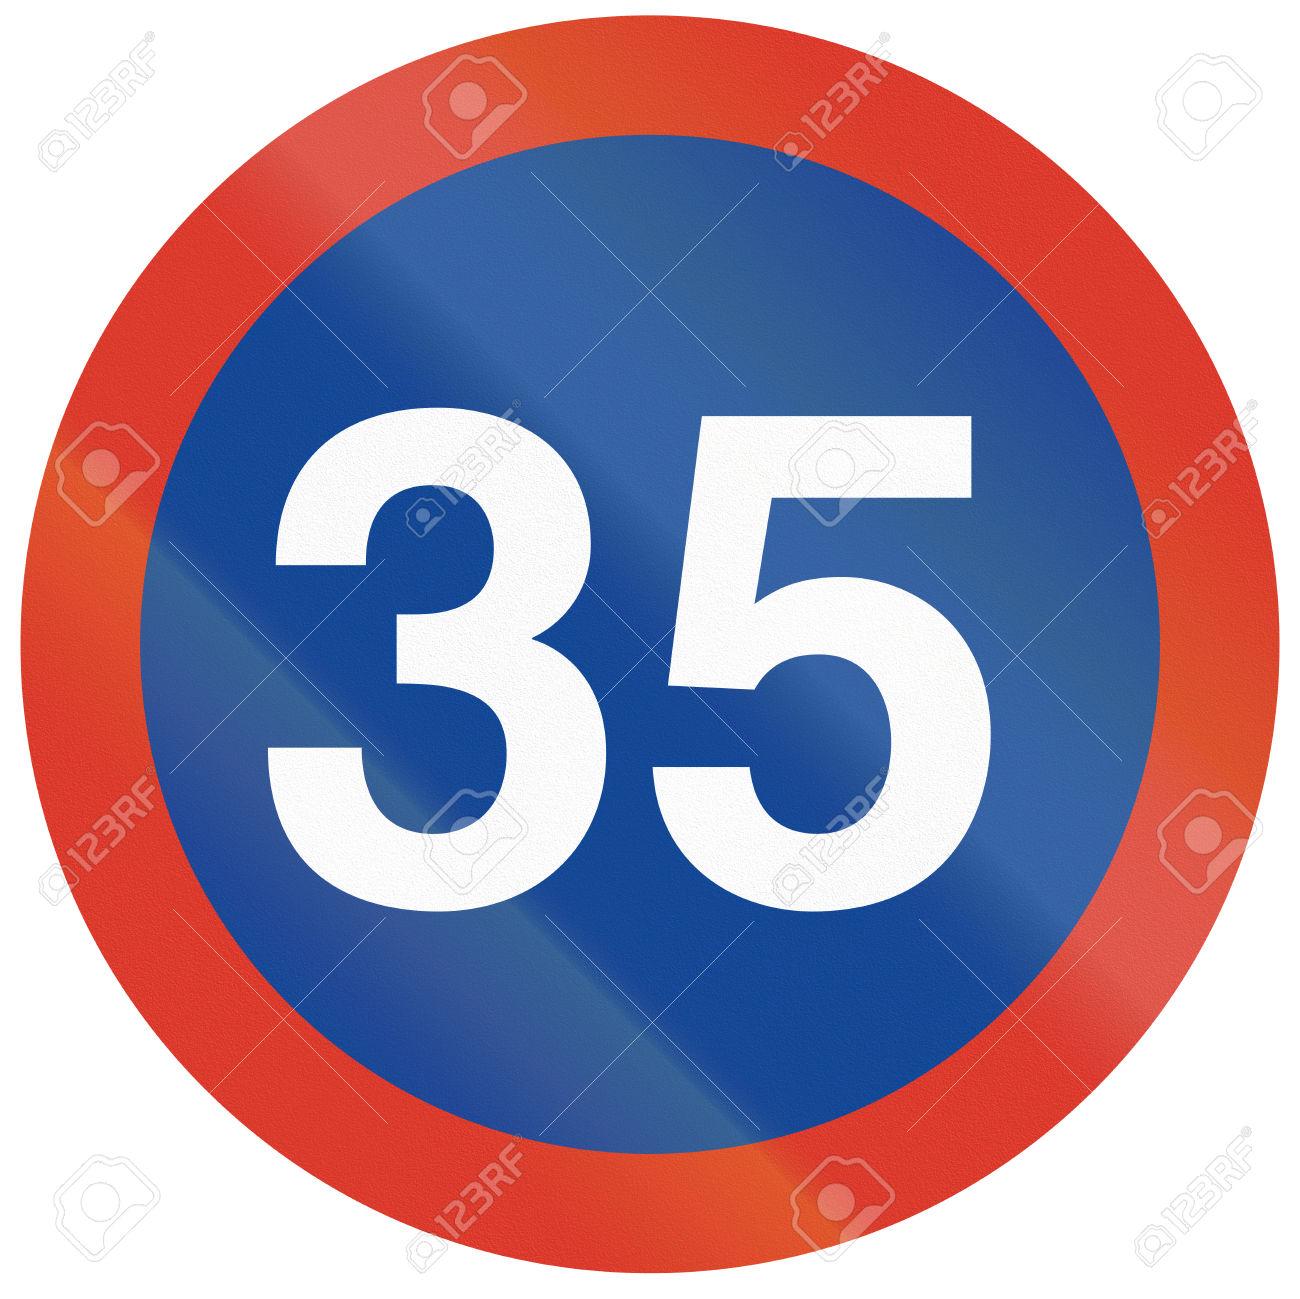 Argeninian Traffic Sign: Minimum Speed Of 35 Kilometers Per Hour.